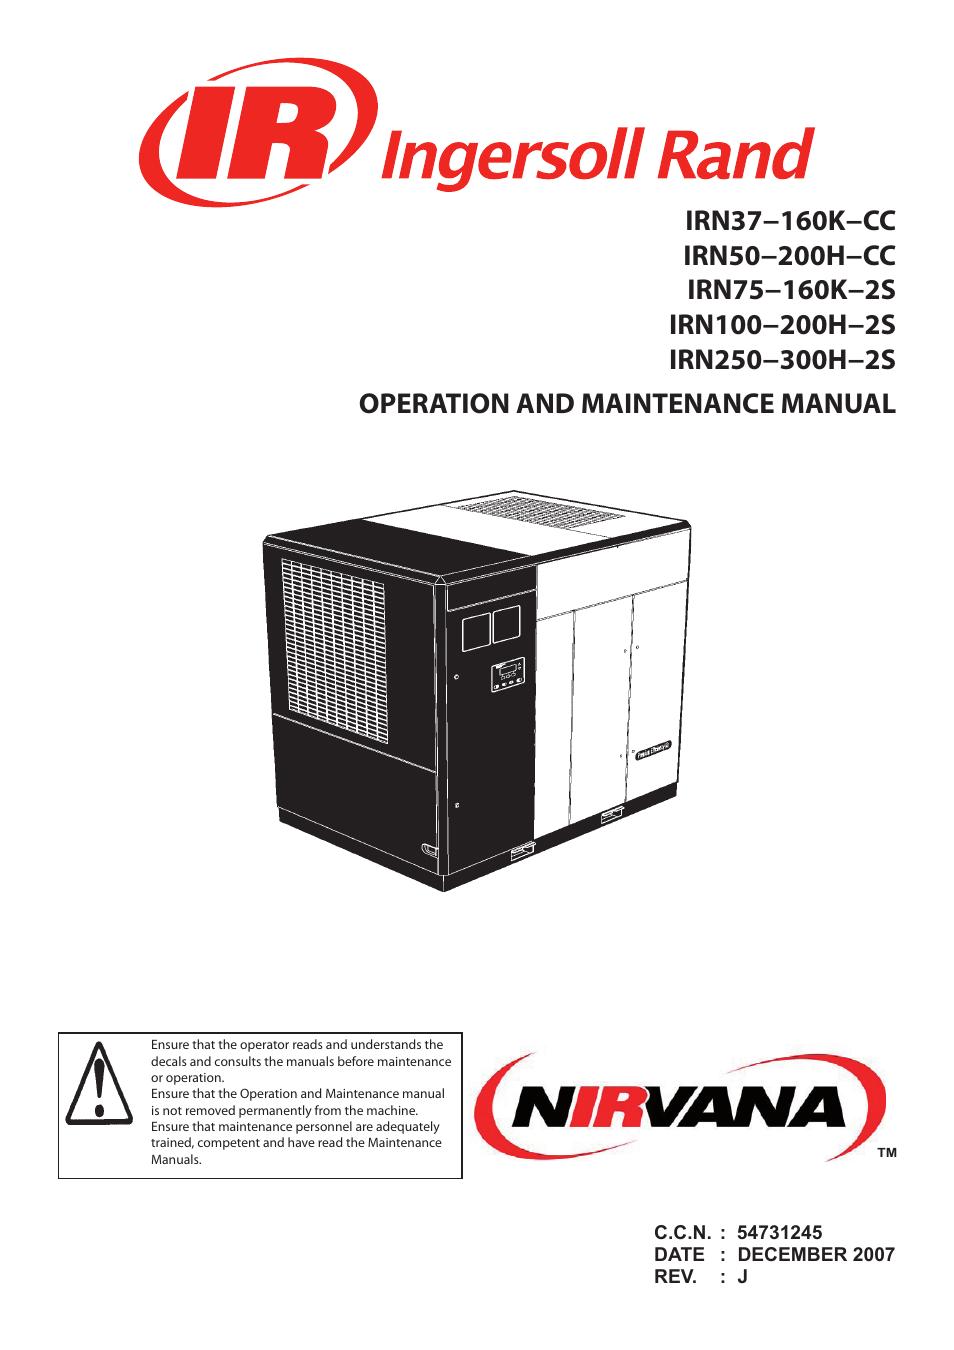 Ingersoll-Rand NIRVANA IRN75-160K-2S User Manual | 100 pages | Also for:  NIRVANA IRN50-200H-CC, NIRVANA IRN100-200H-2S, NIRVANA IRN37-160K-CC, ...